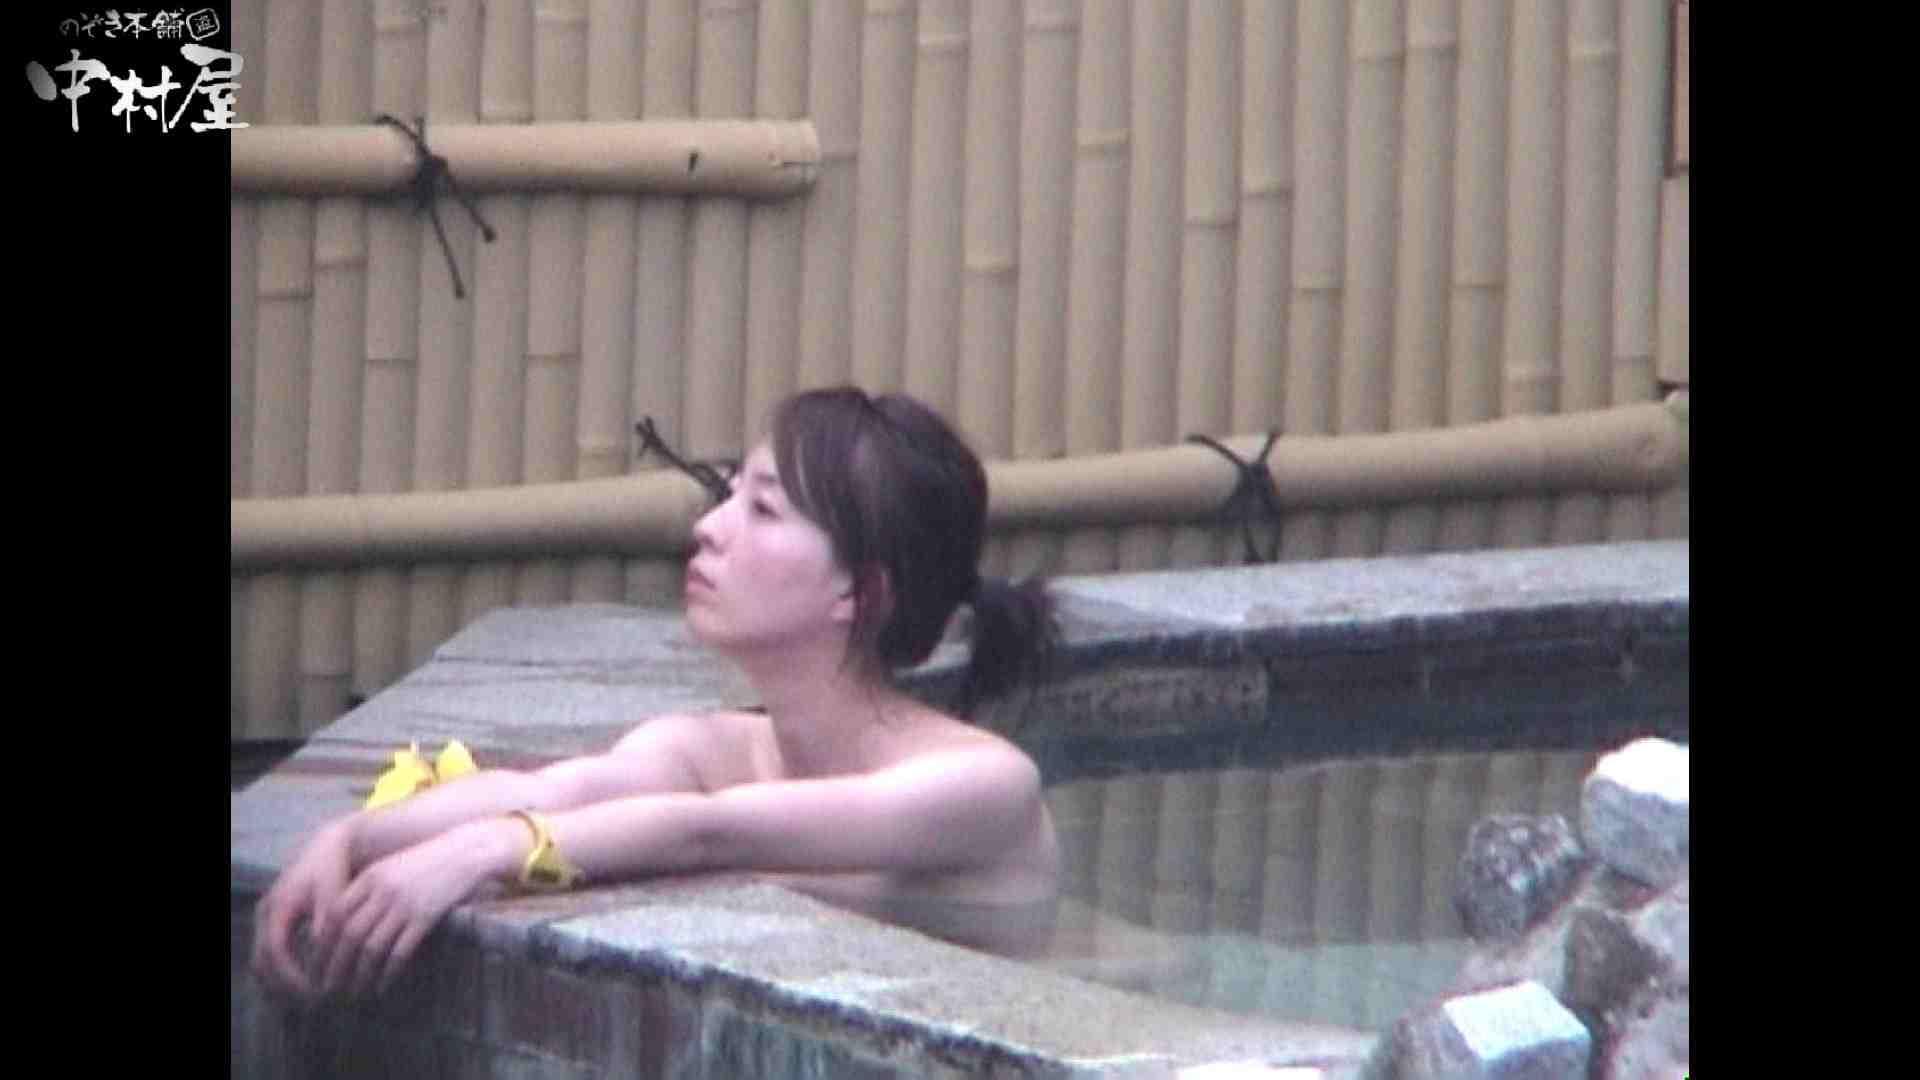 Aquaな露天風呂Vol.964 綺麗なOLたち オメコ無修正動画無料 97枚 62